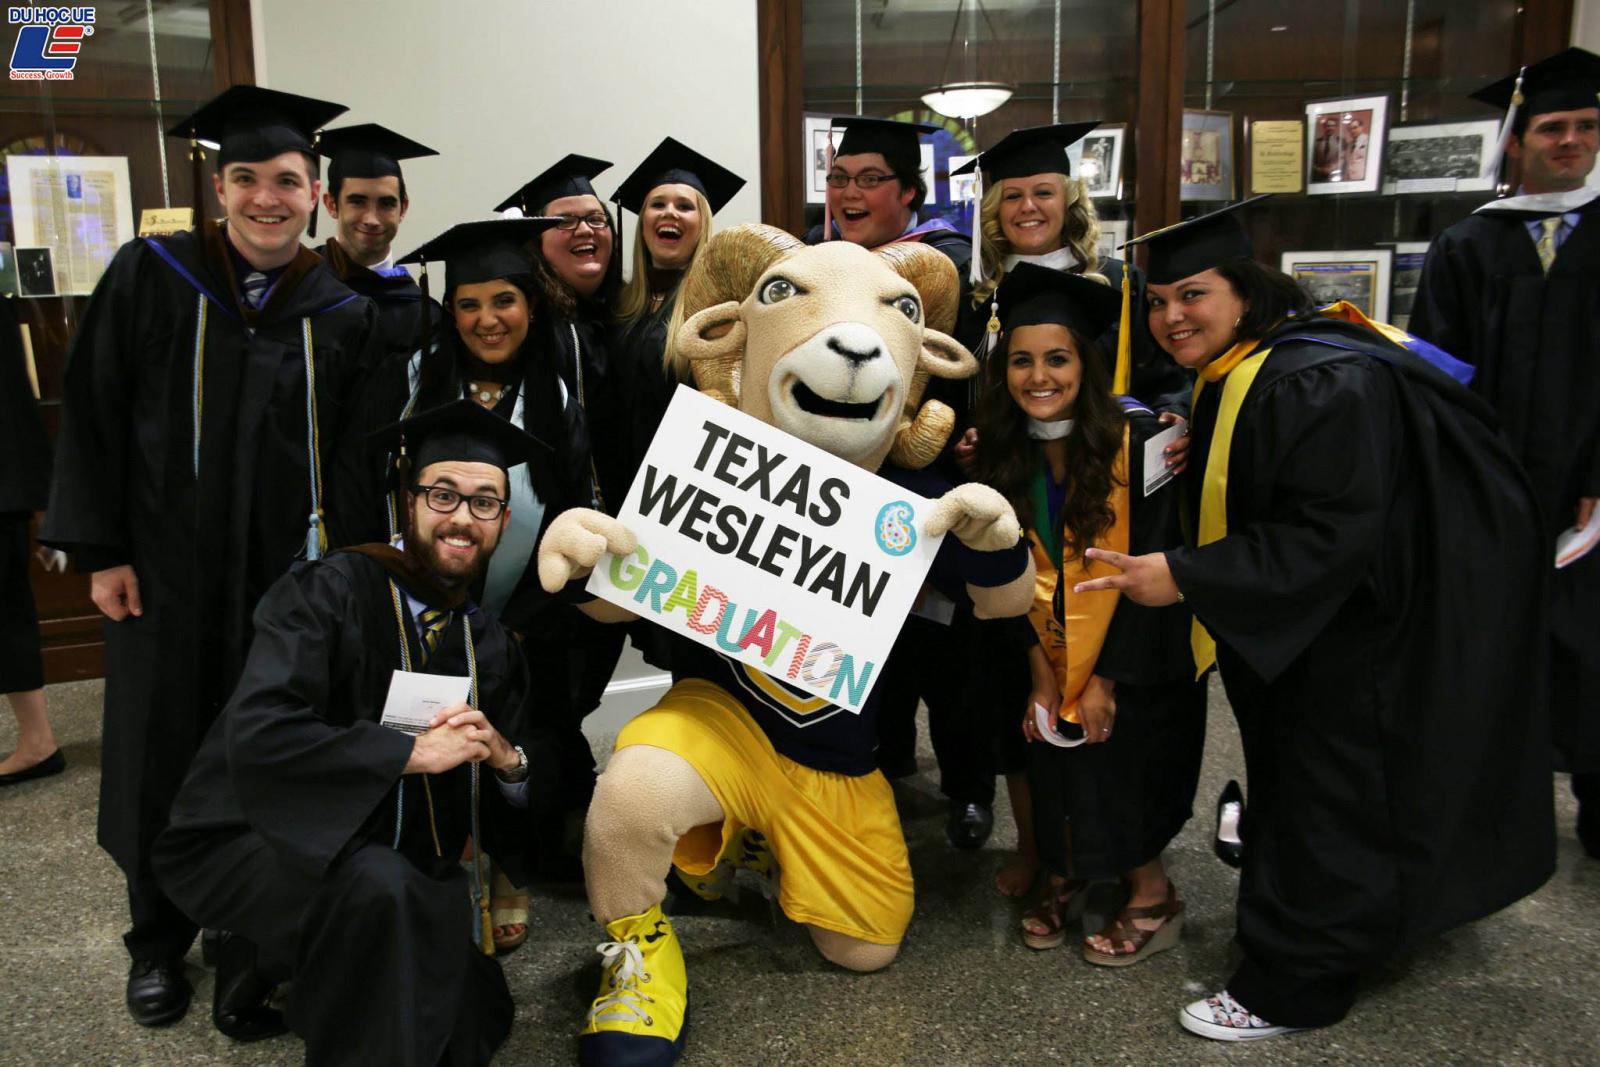 texas-wesleyan-university-truong-dai-hoc-bien-giac-mo-my-thanh-hien-thuc